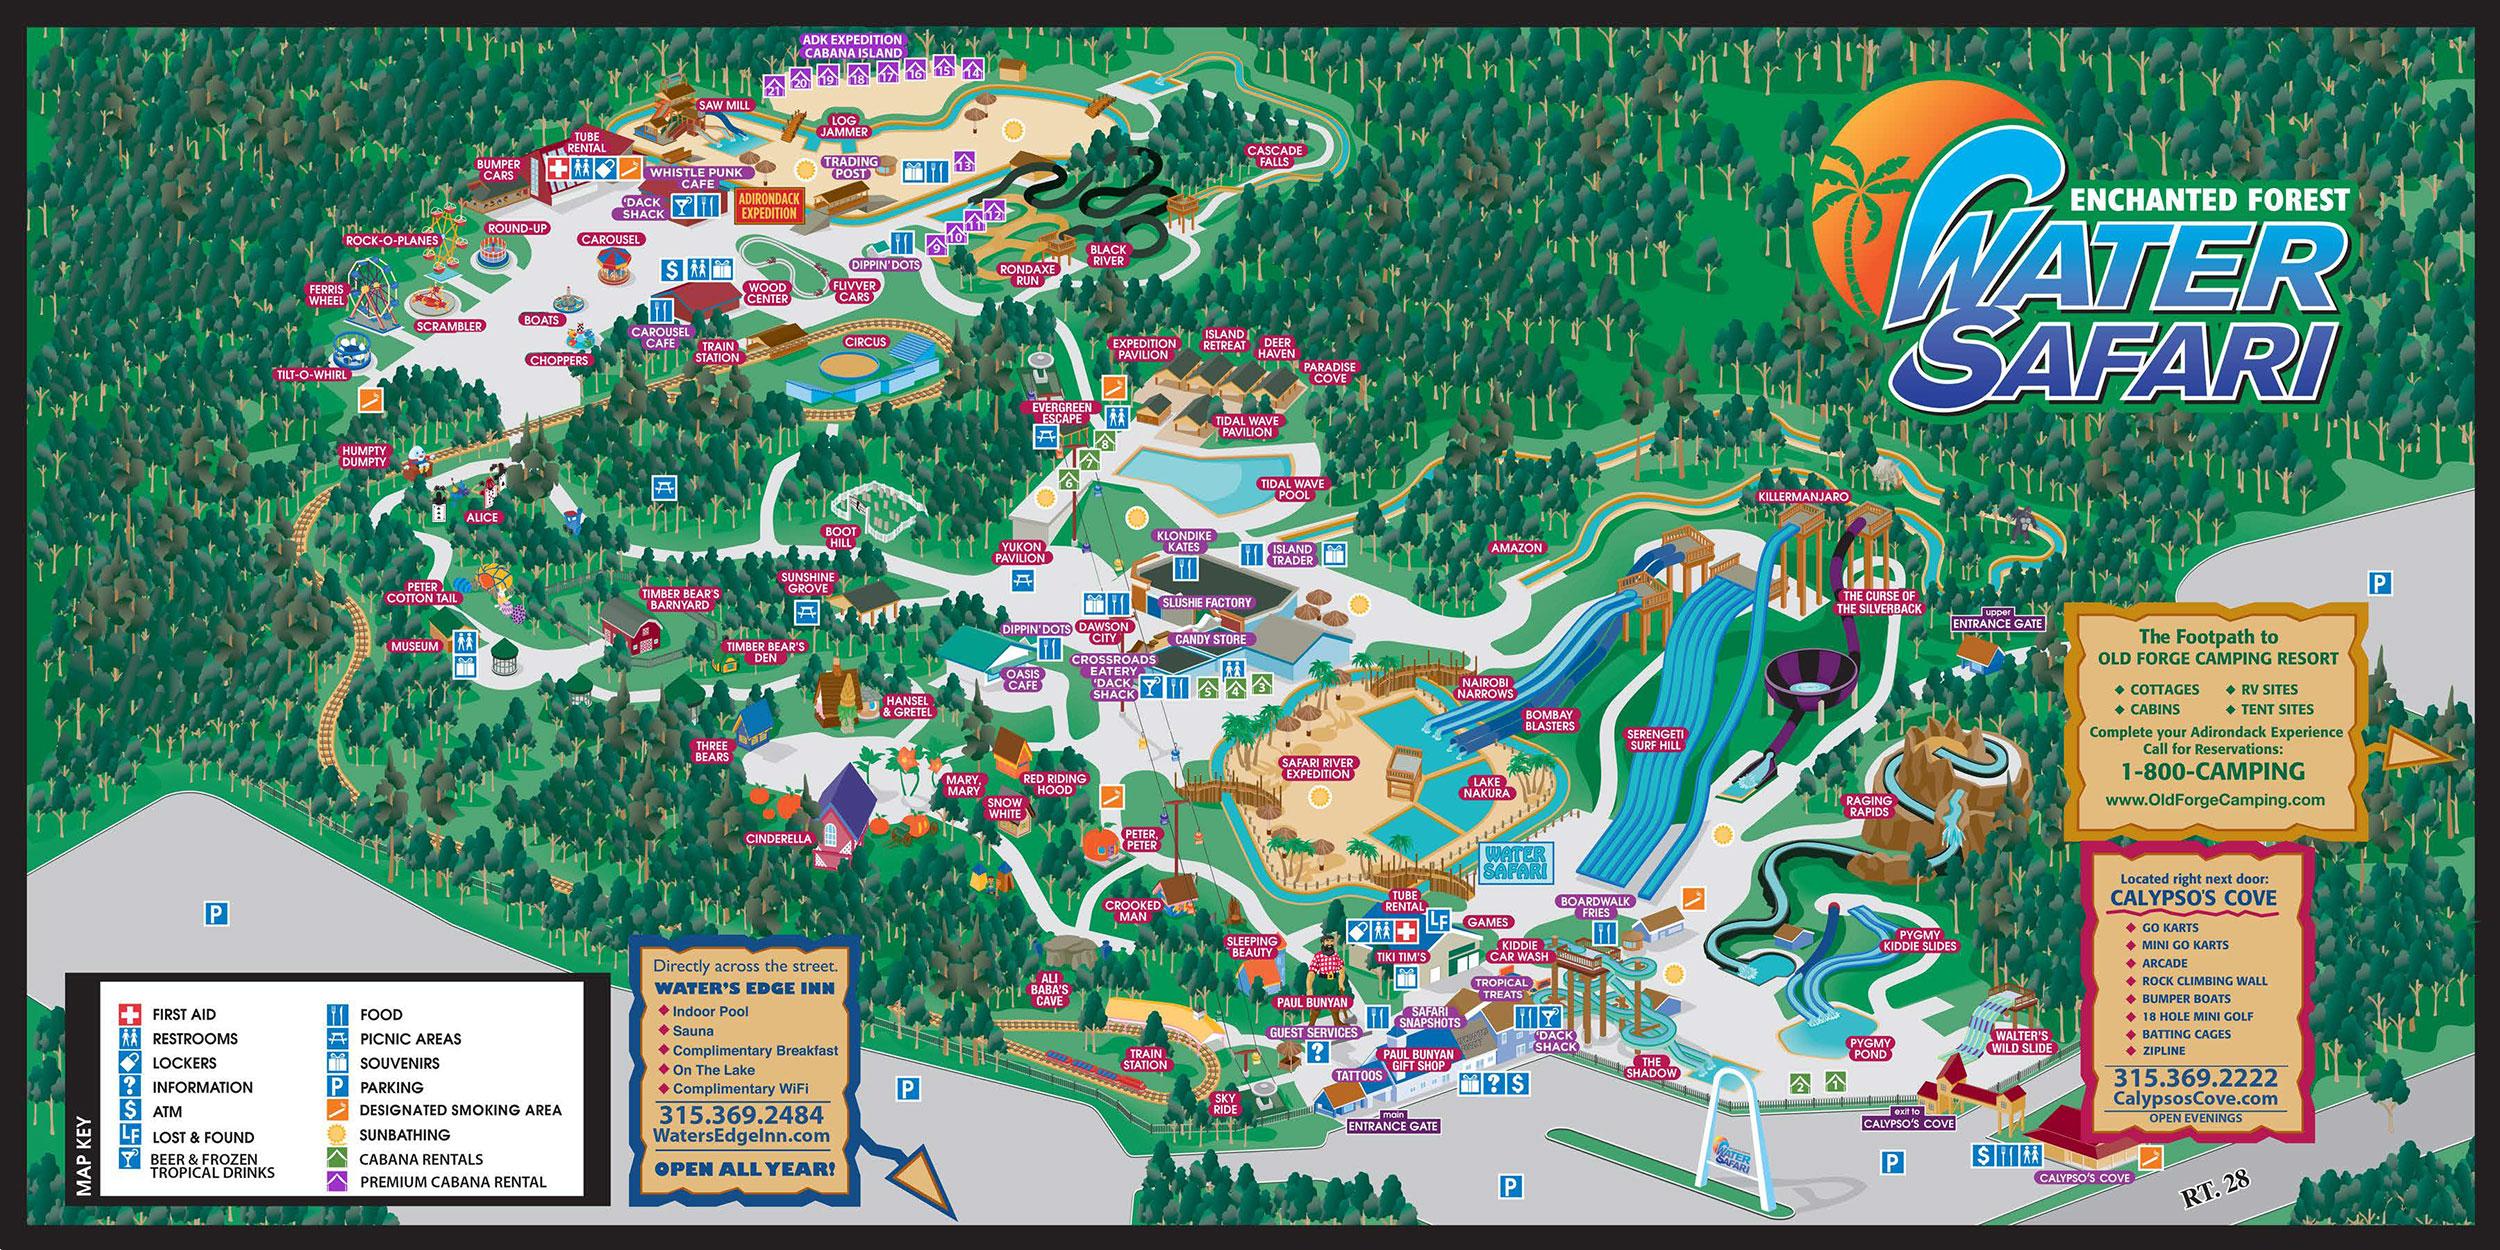 Interactive Park Map - Enchanted Forest Water Safari on malaysia map, thailand map, disneyland map, bangkok map, lumpini park map, amusement park map, erawan shrine map, drayton manor theme park map, cambodia map, zoo map, singapore map,